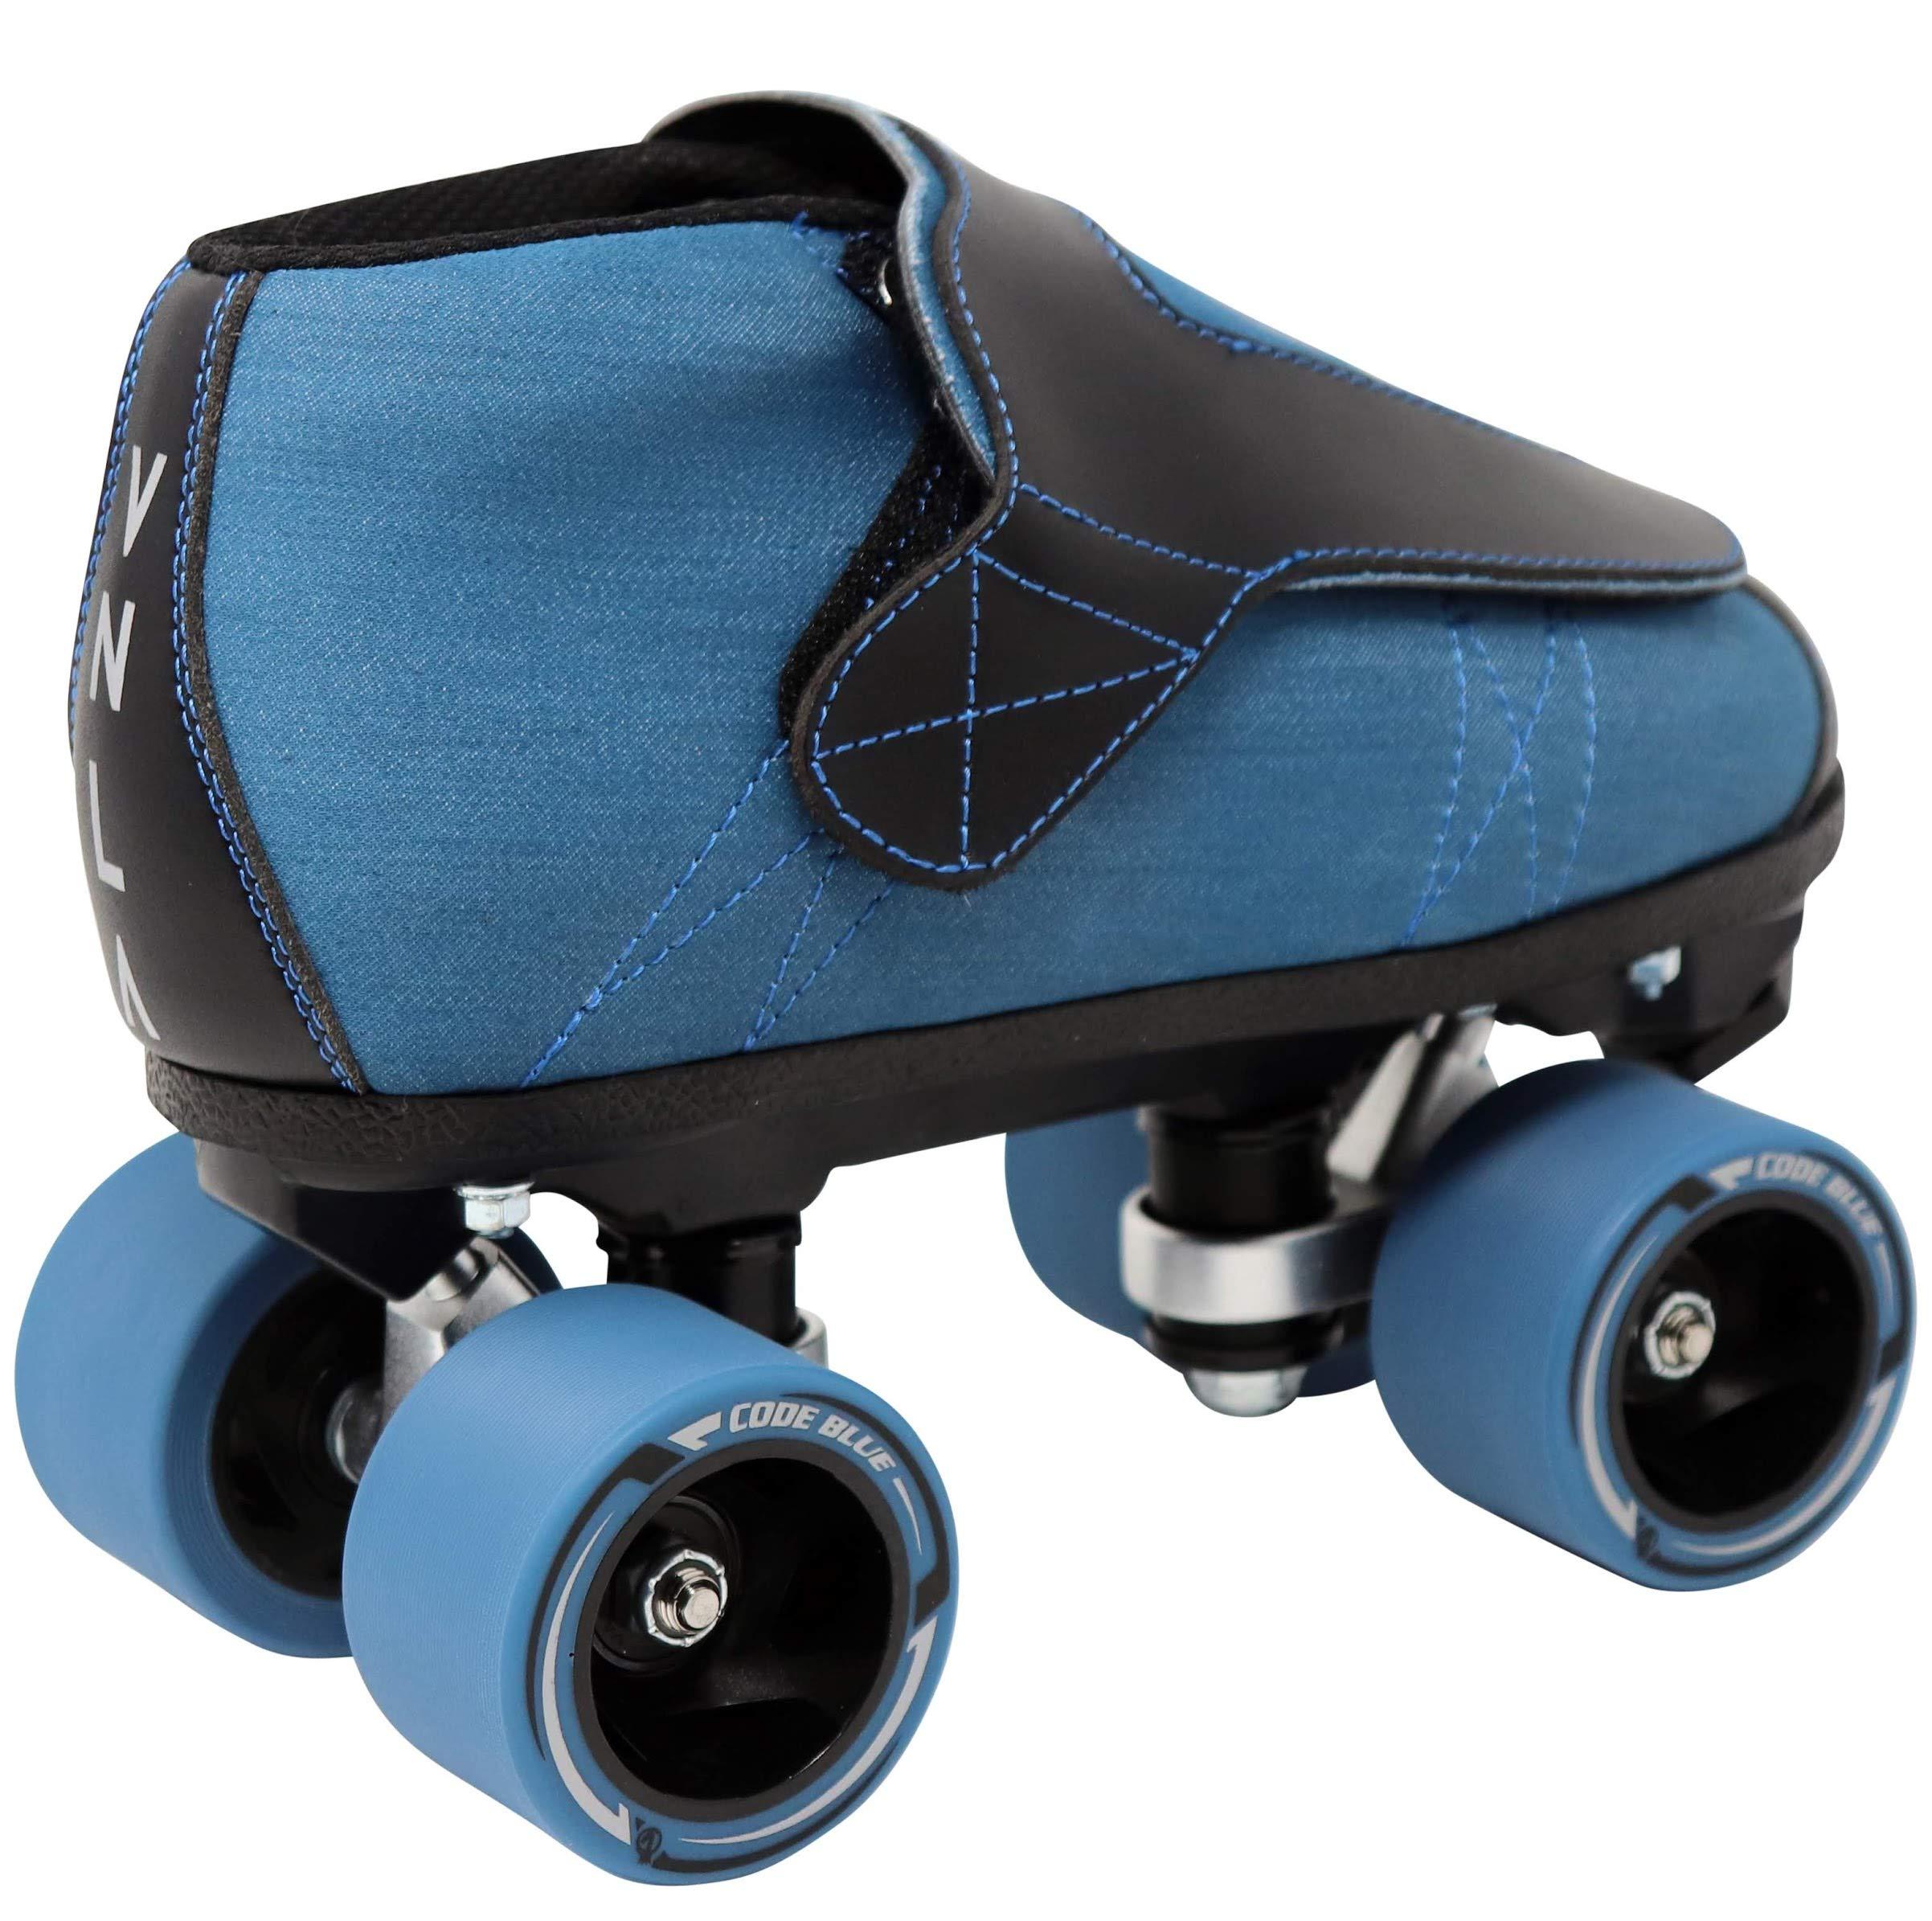 VNLA Code Blue Jam Skate - Mens & Womens Speed Skates - Quad Skates for Women & Men - Adjustable Roller Skate/Rollerskates - Outdoor & Indoor Adult Quad Skate - Kid/Kids Roller Skates (Size 6) by VNLA (Image #3)